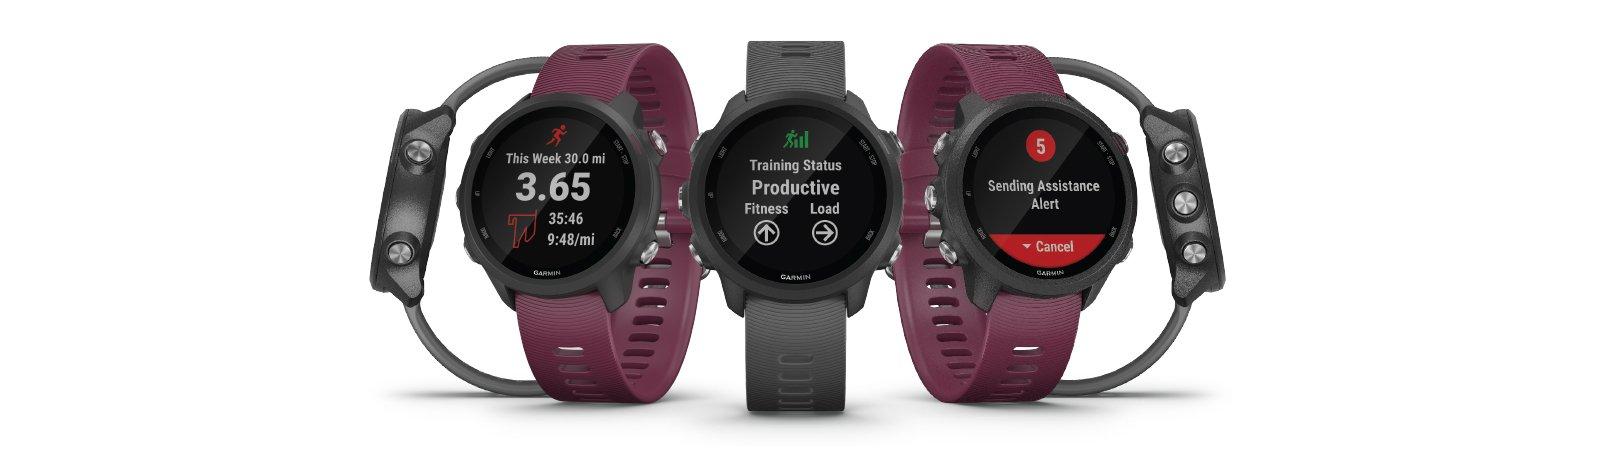 Bėgimo laikrodis Garmin Forerunner 245